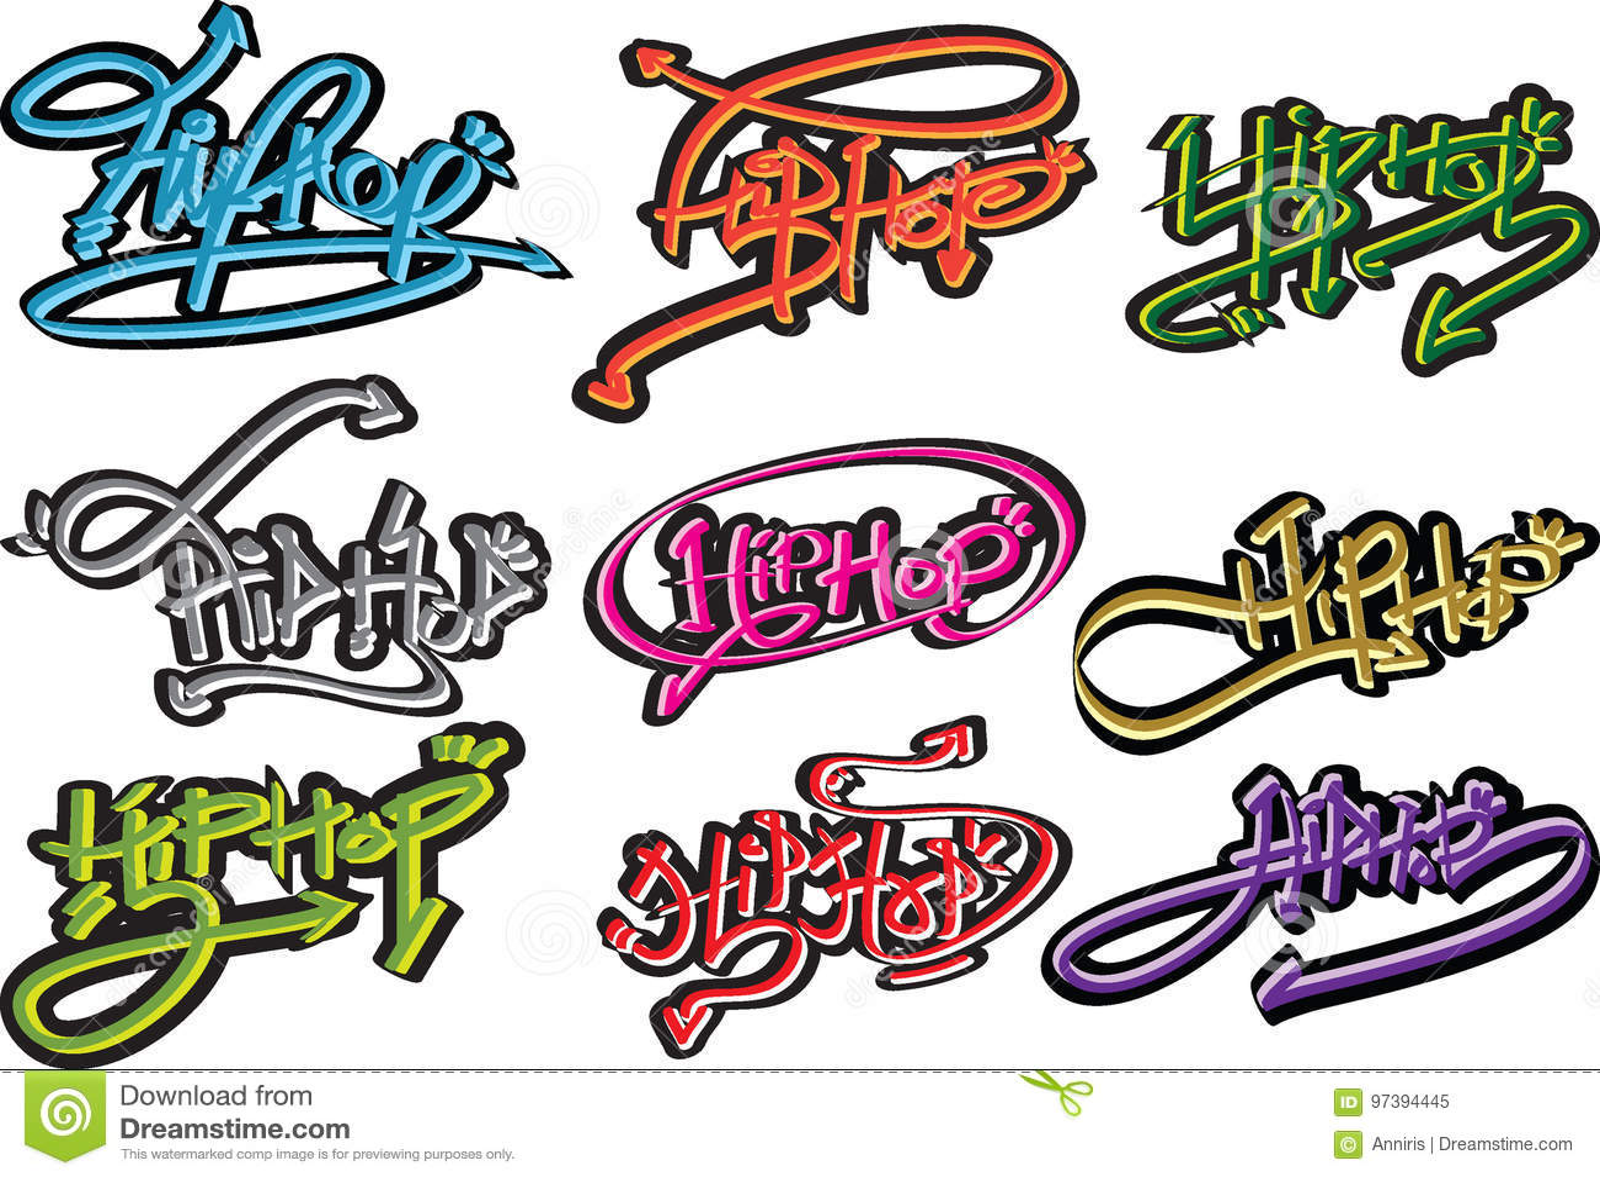 Hip-hop vector font design, english hip hop wordart, hip hop.